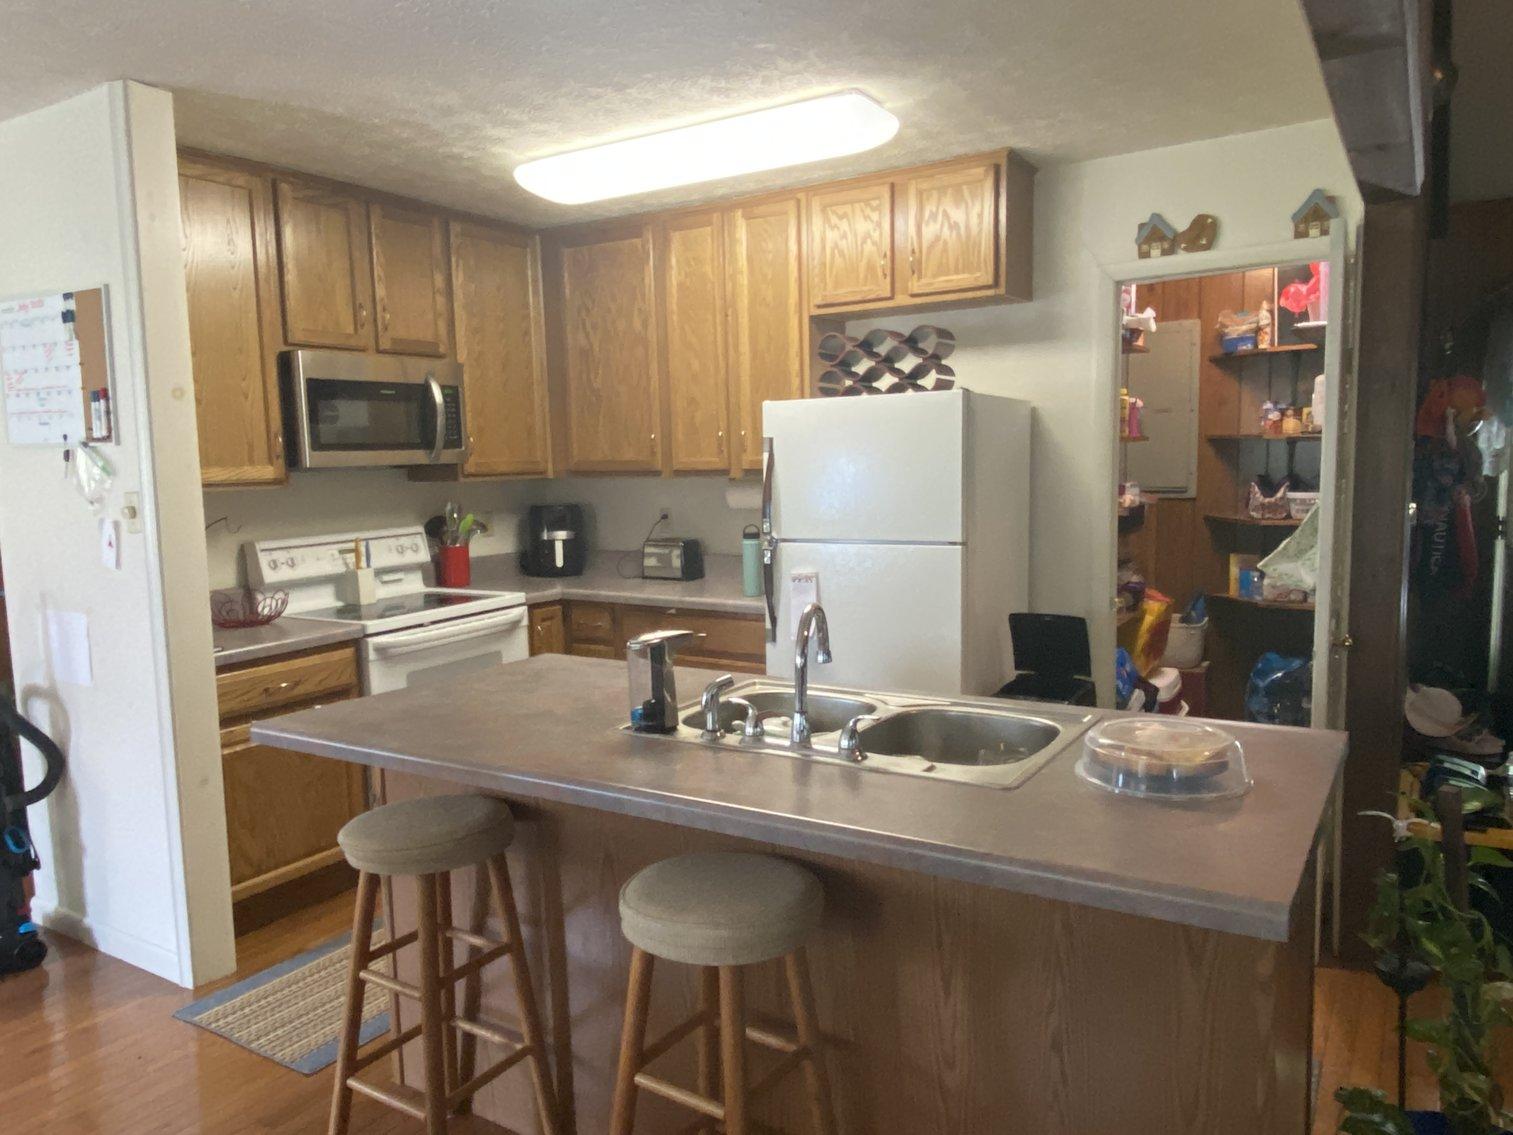 Image for 3 BR/2 BA Home on 4.38 +/- Acres w/2 Quality Workshop/Garages in Orange County, VA--SELLS to the HIGHEST BIDDER!!